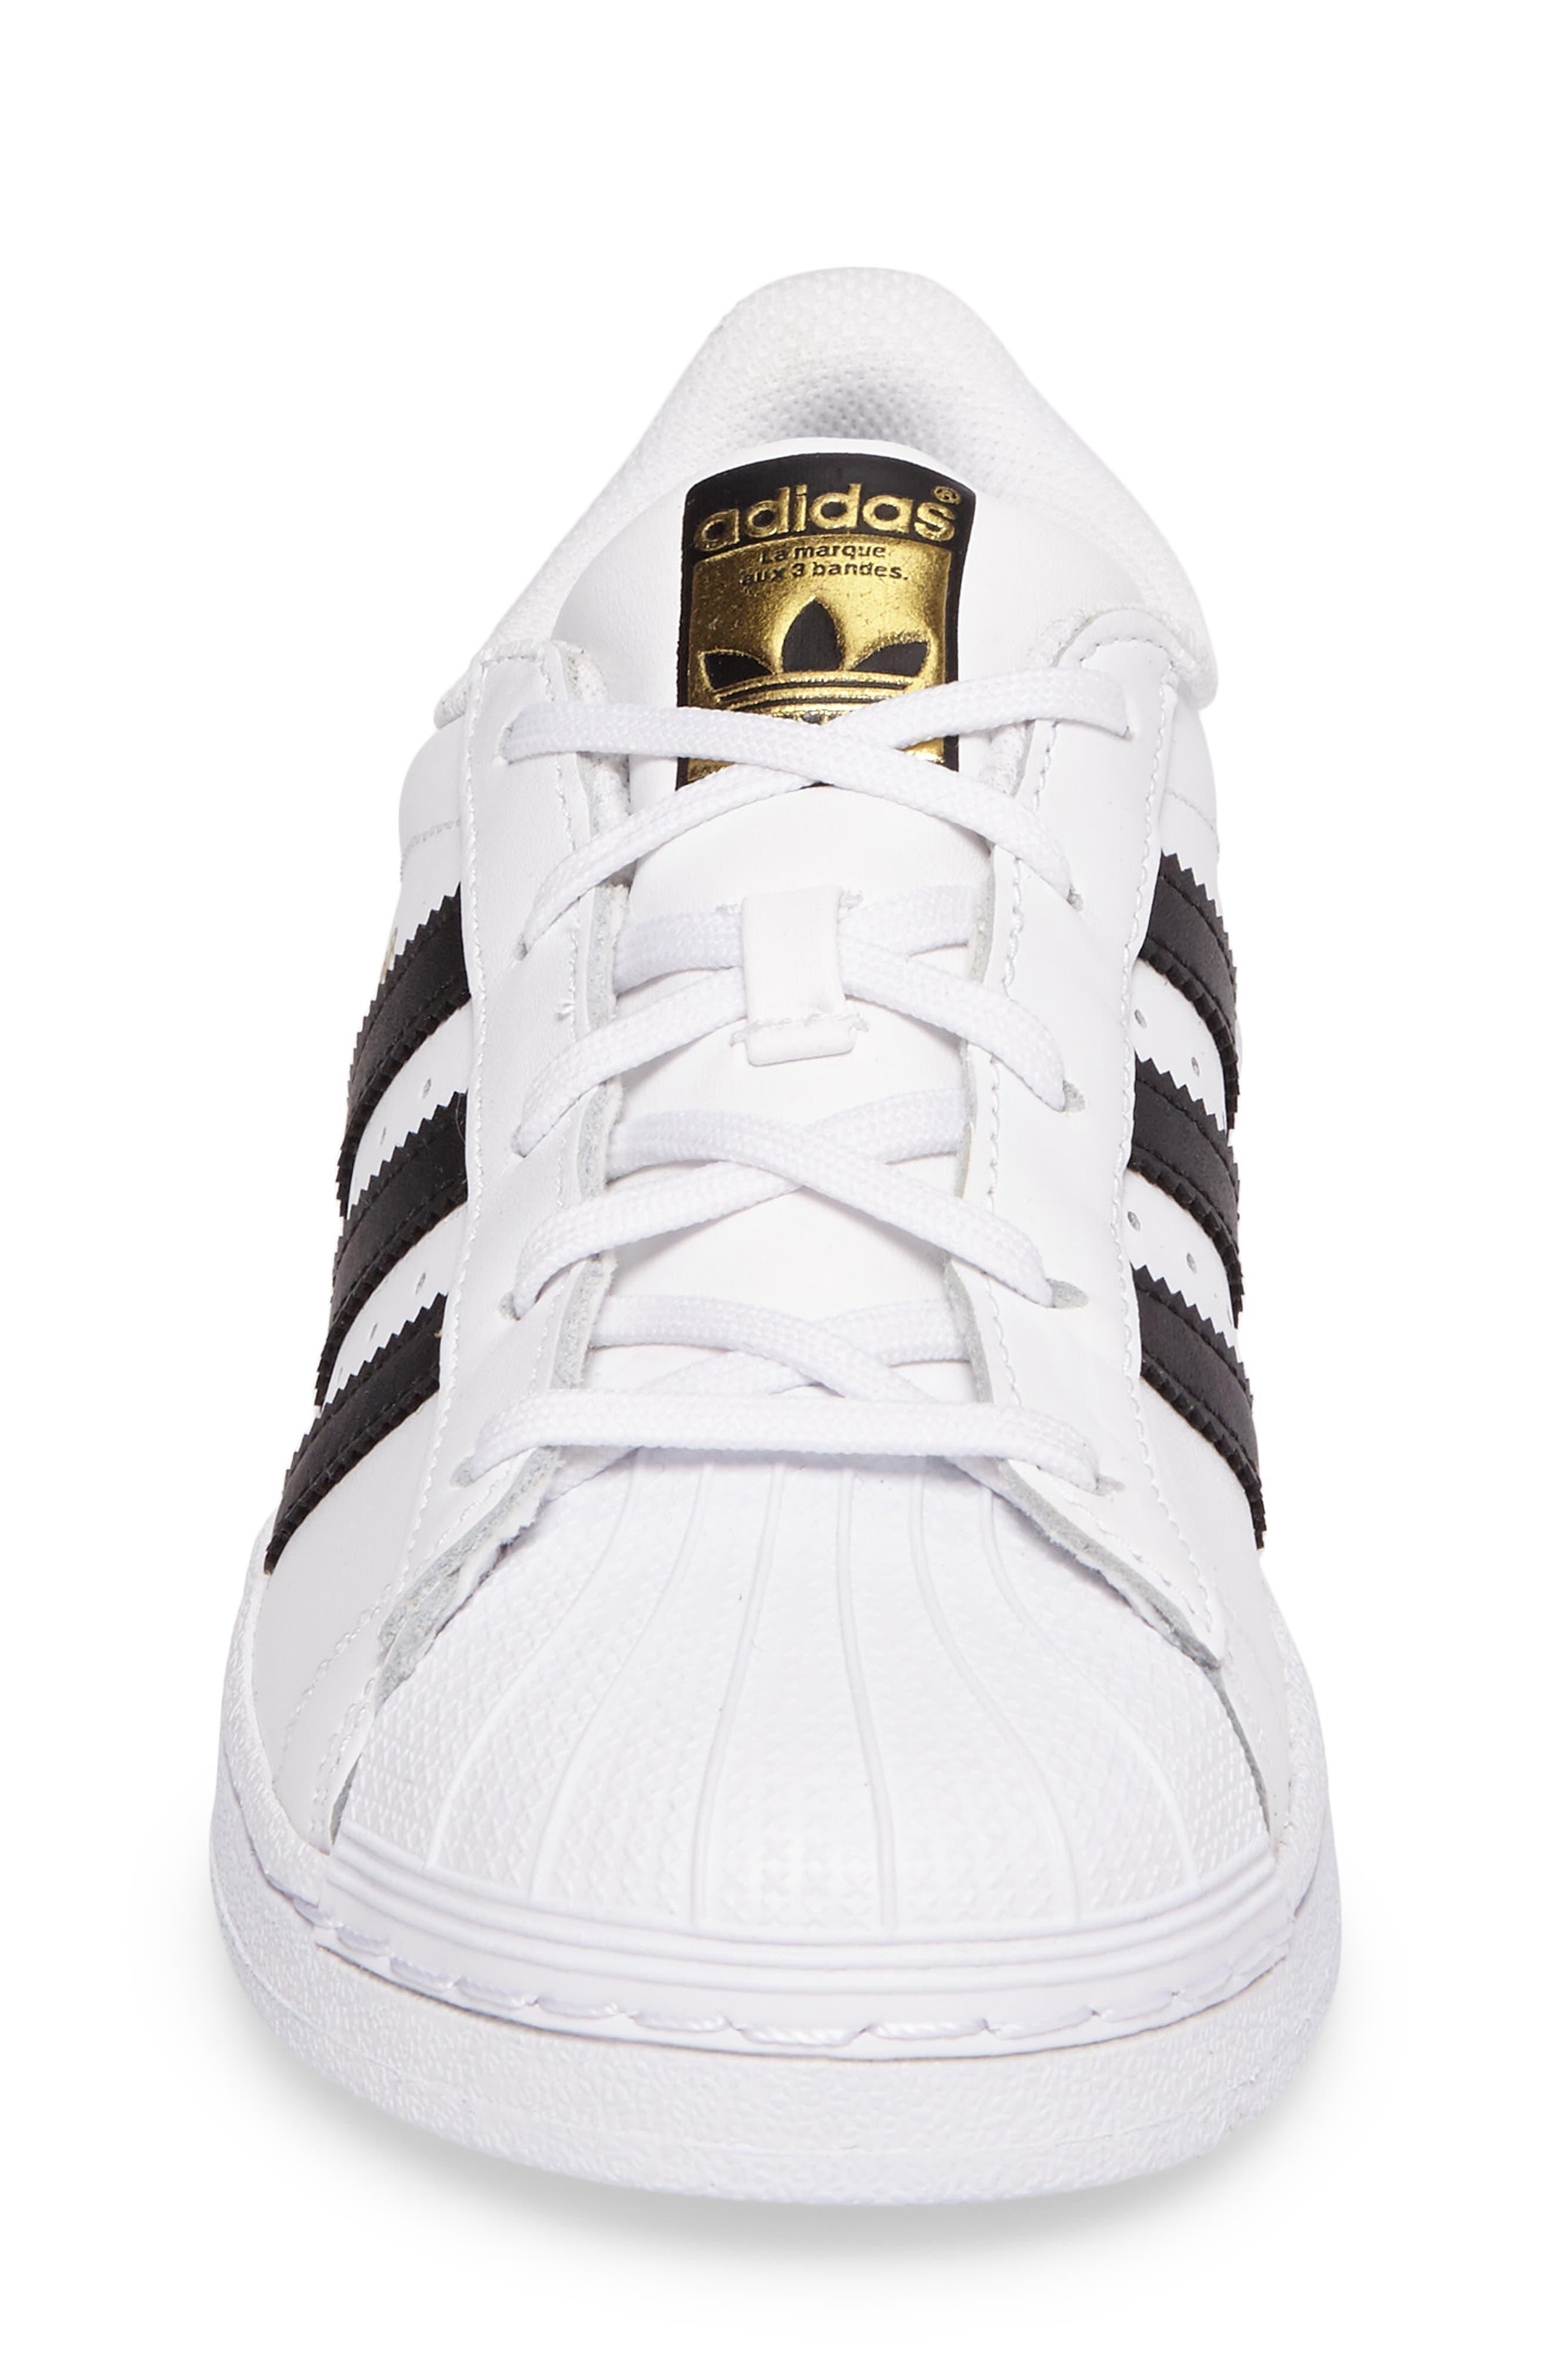 ADIDAS, 'Superstar Foundation' Sneaker, Alternate thumbnail 4, color, WHITE/ BLACK